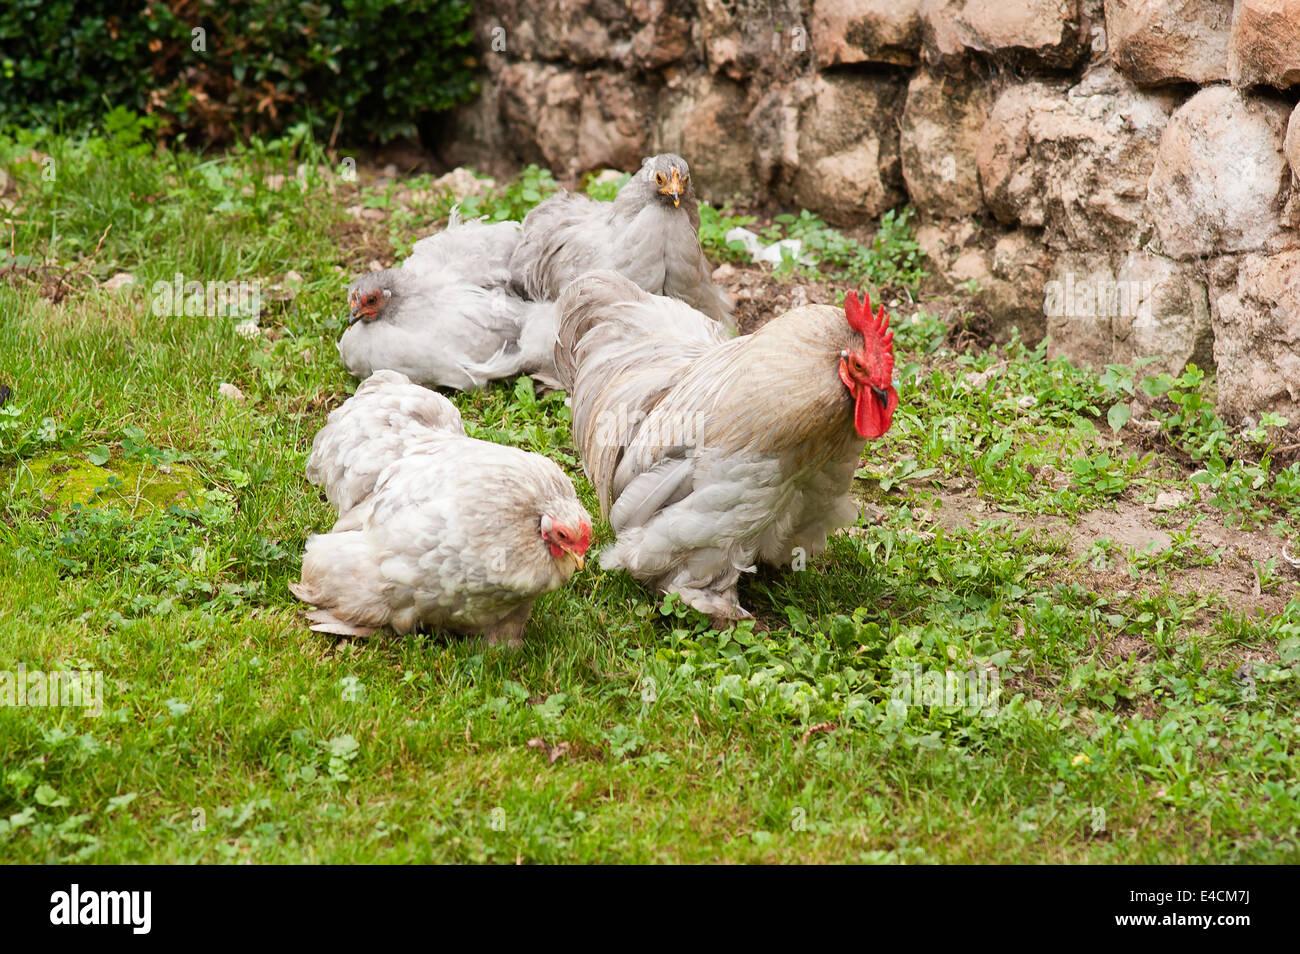 Lavender Pekin Bantam cockerel and his hens in the grass - Stock Image